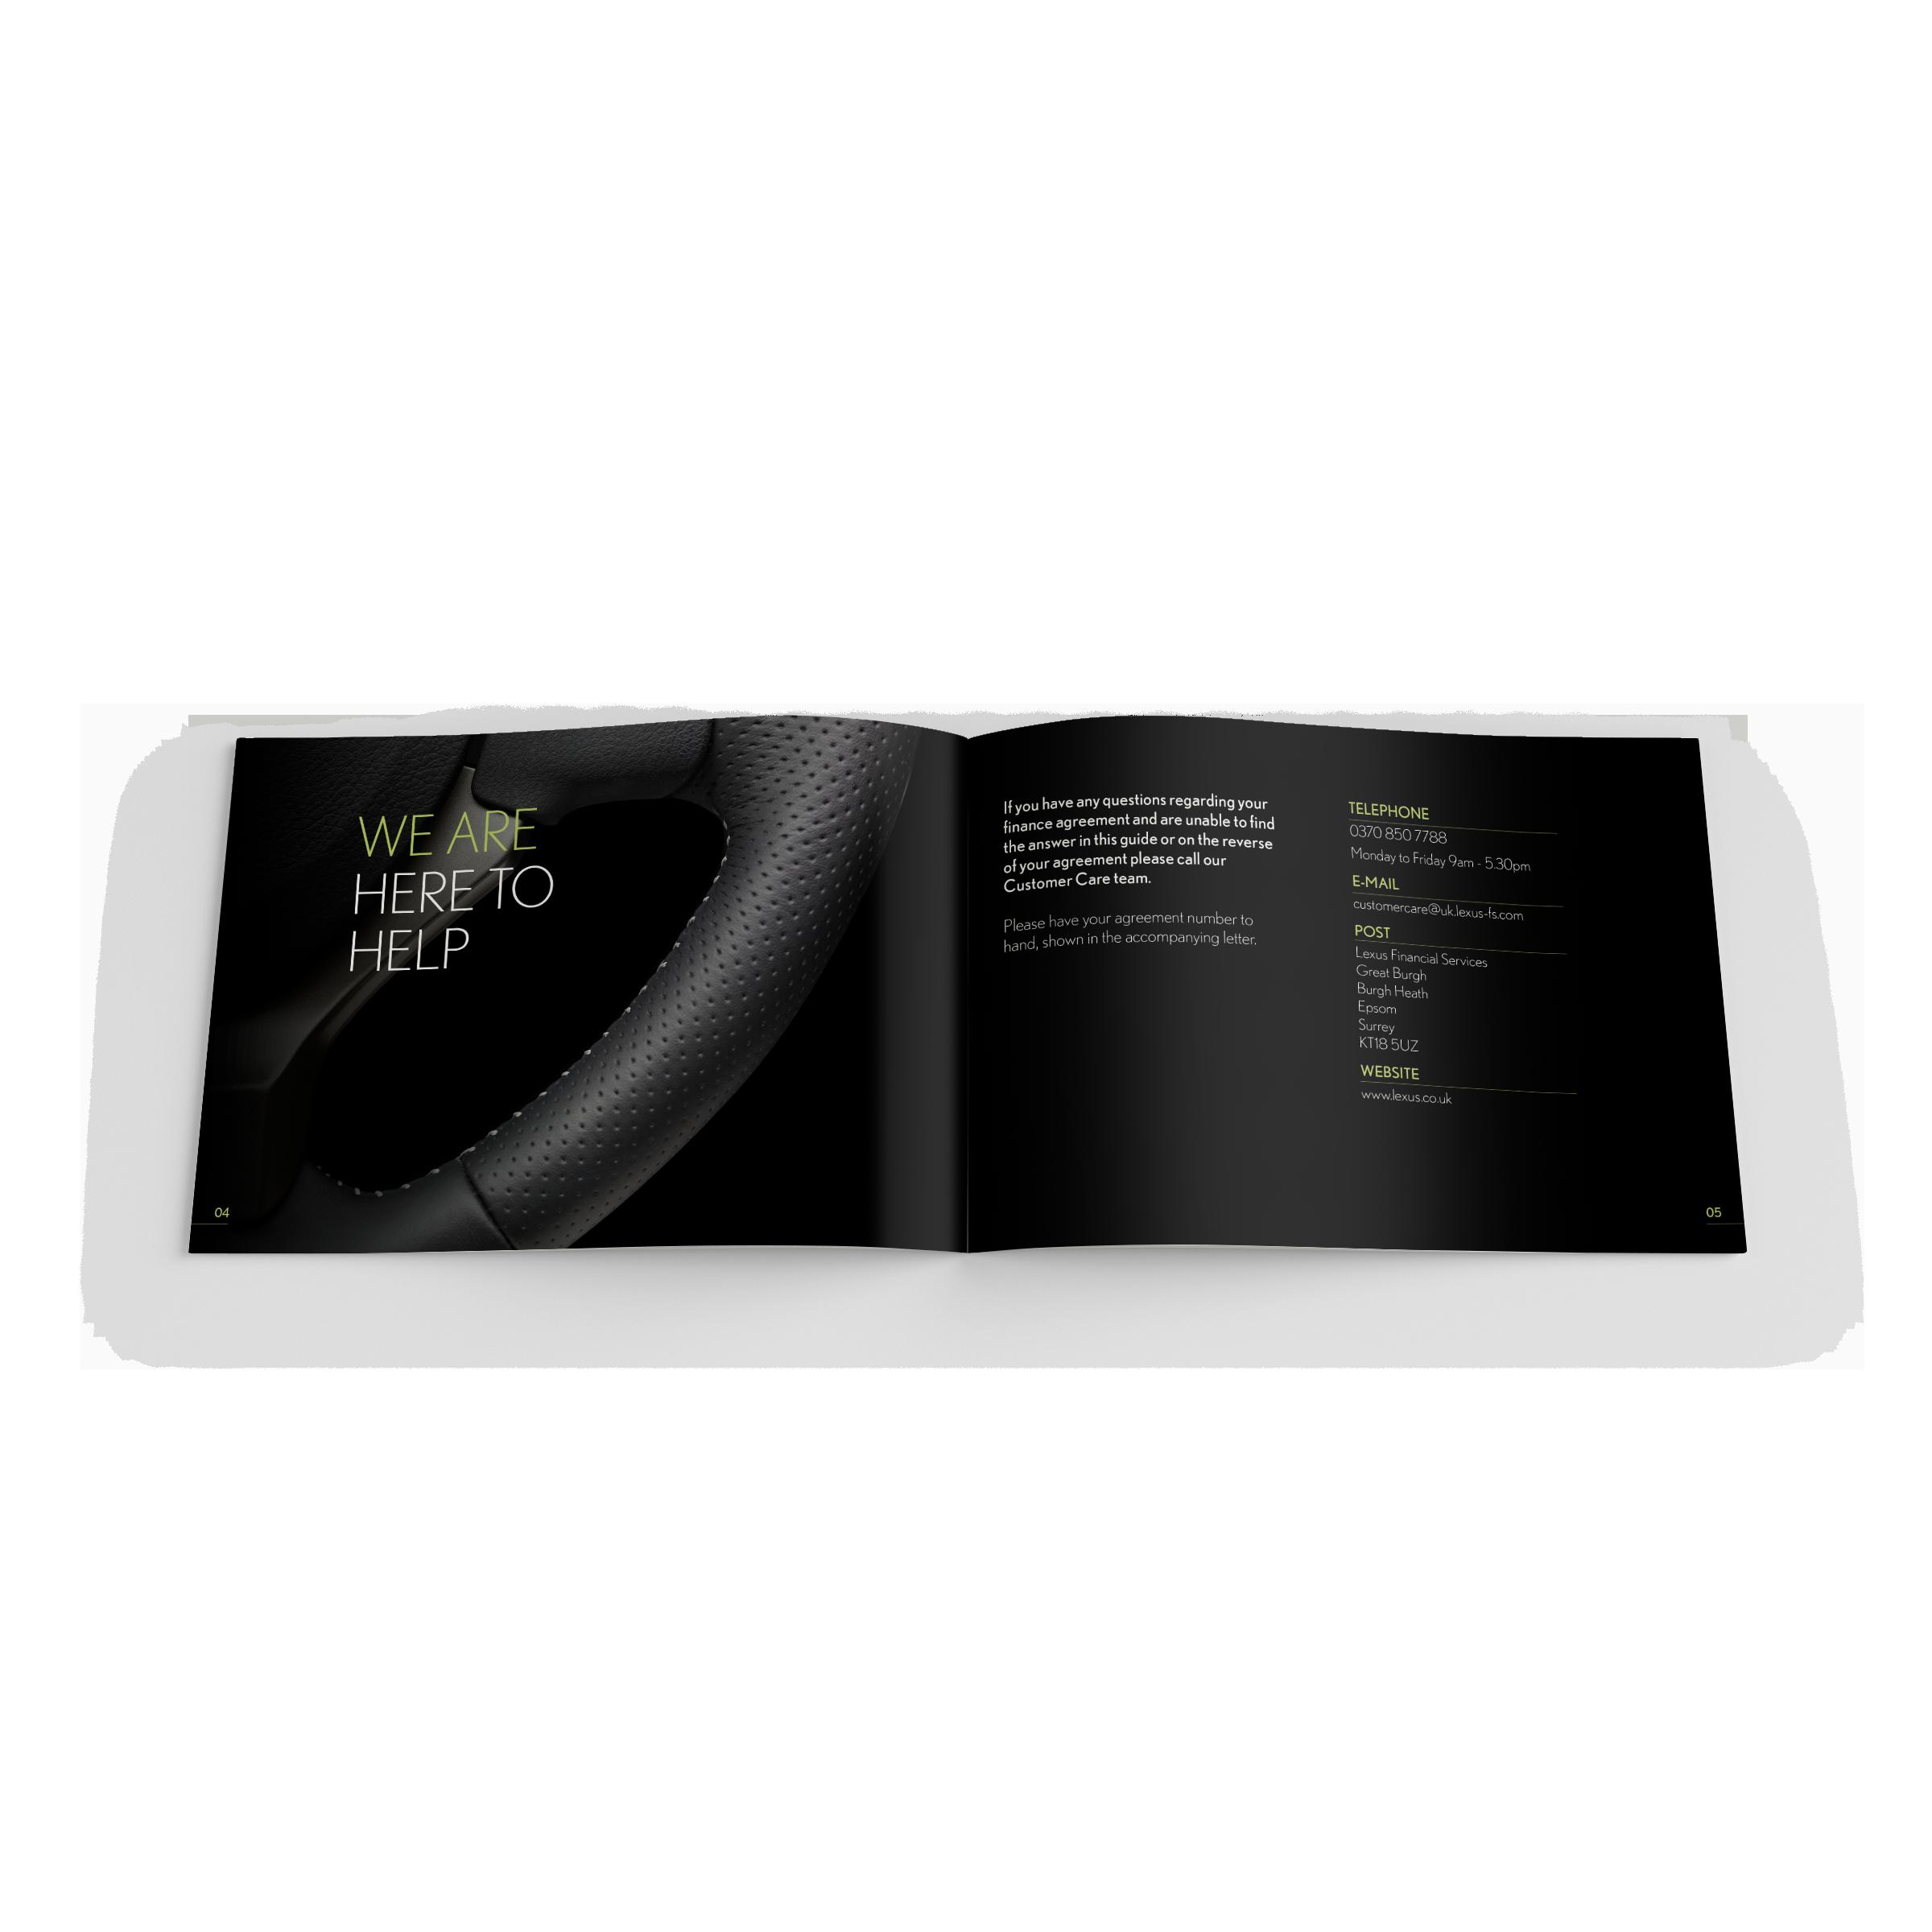 Lexus Financial Services >> Me Him Design Wonderful Creativity Business Acumen